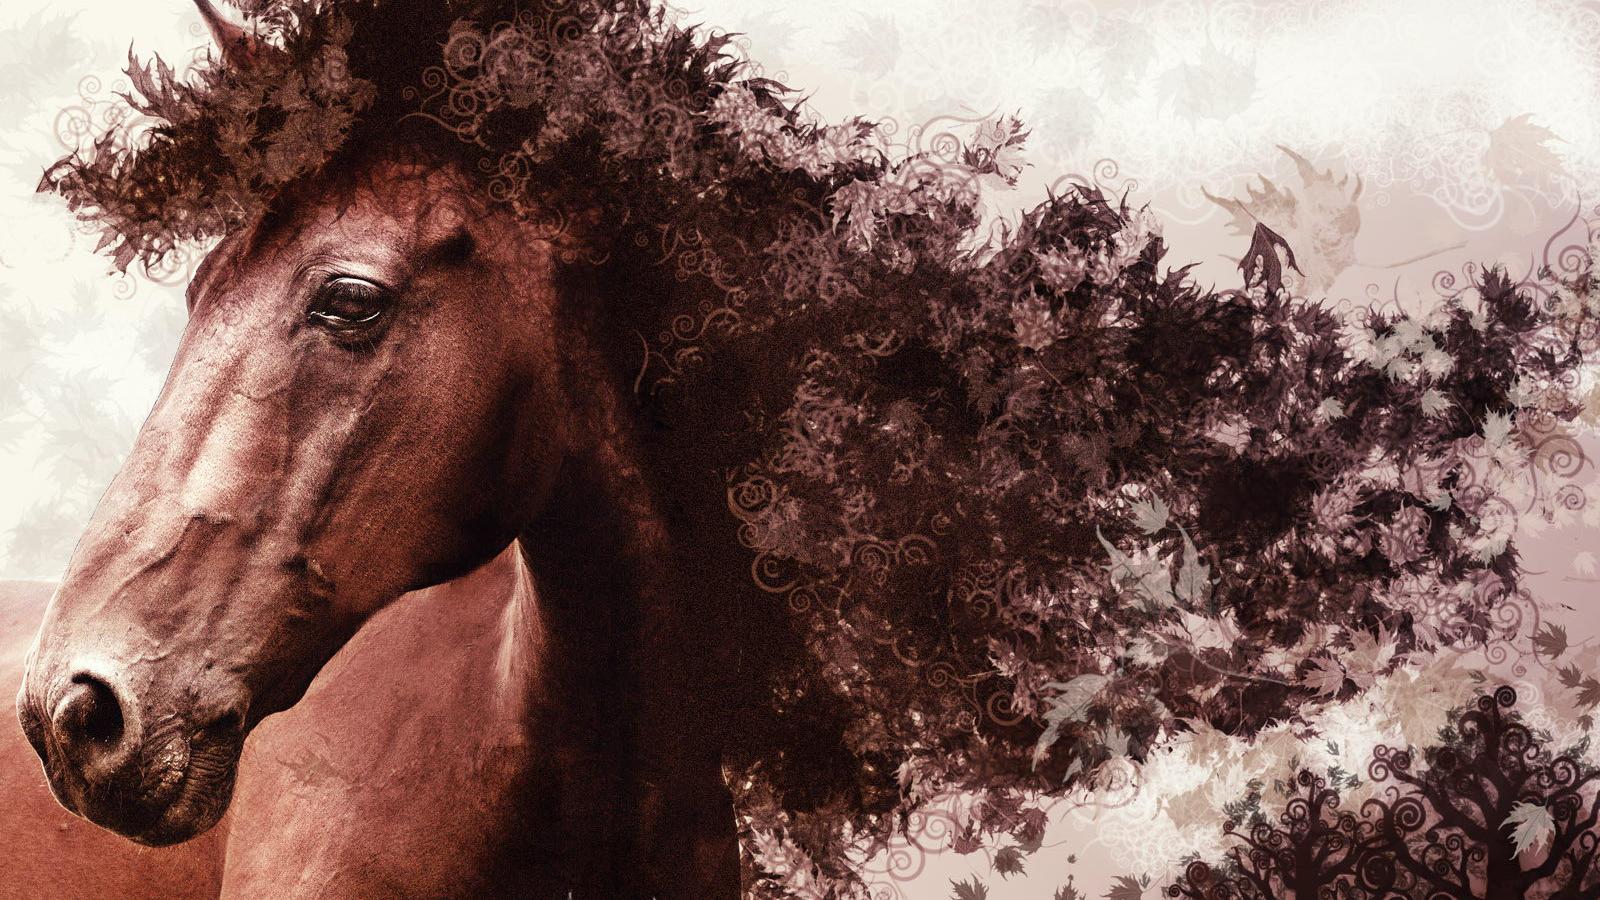 Free Download Horse Wallpaper Download Best Effect Artistic Horse